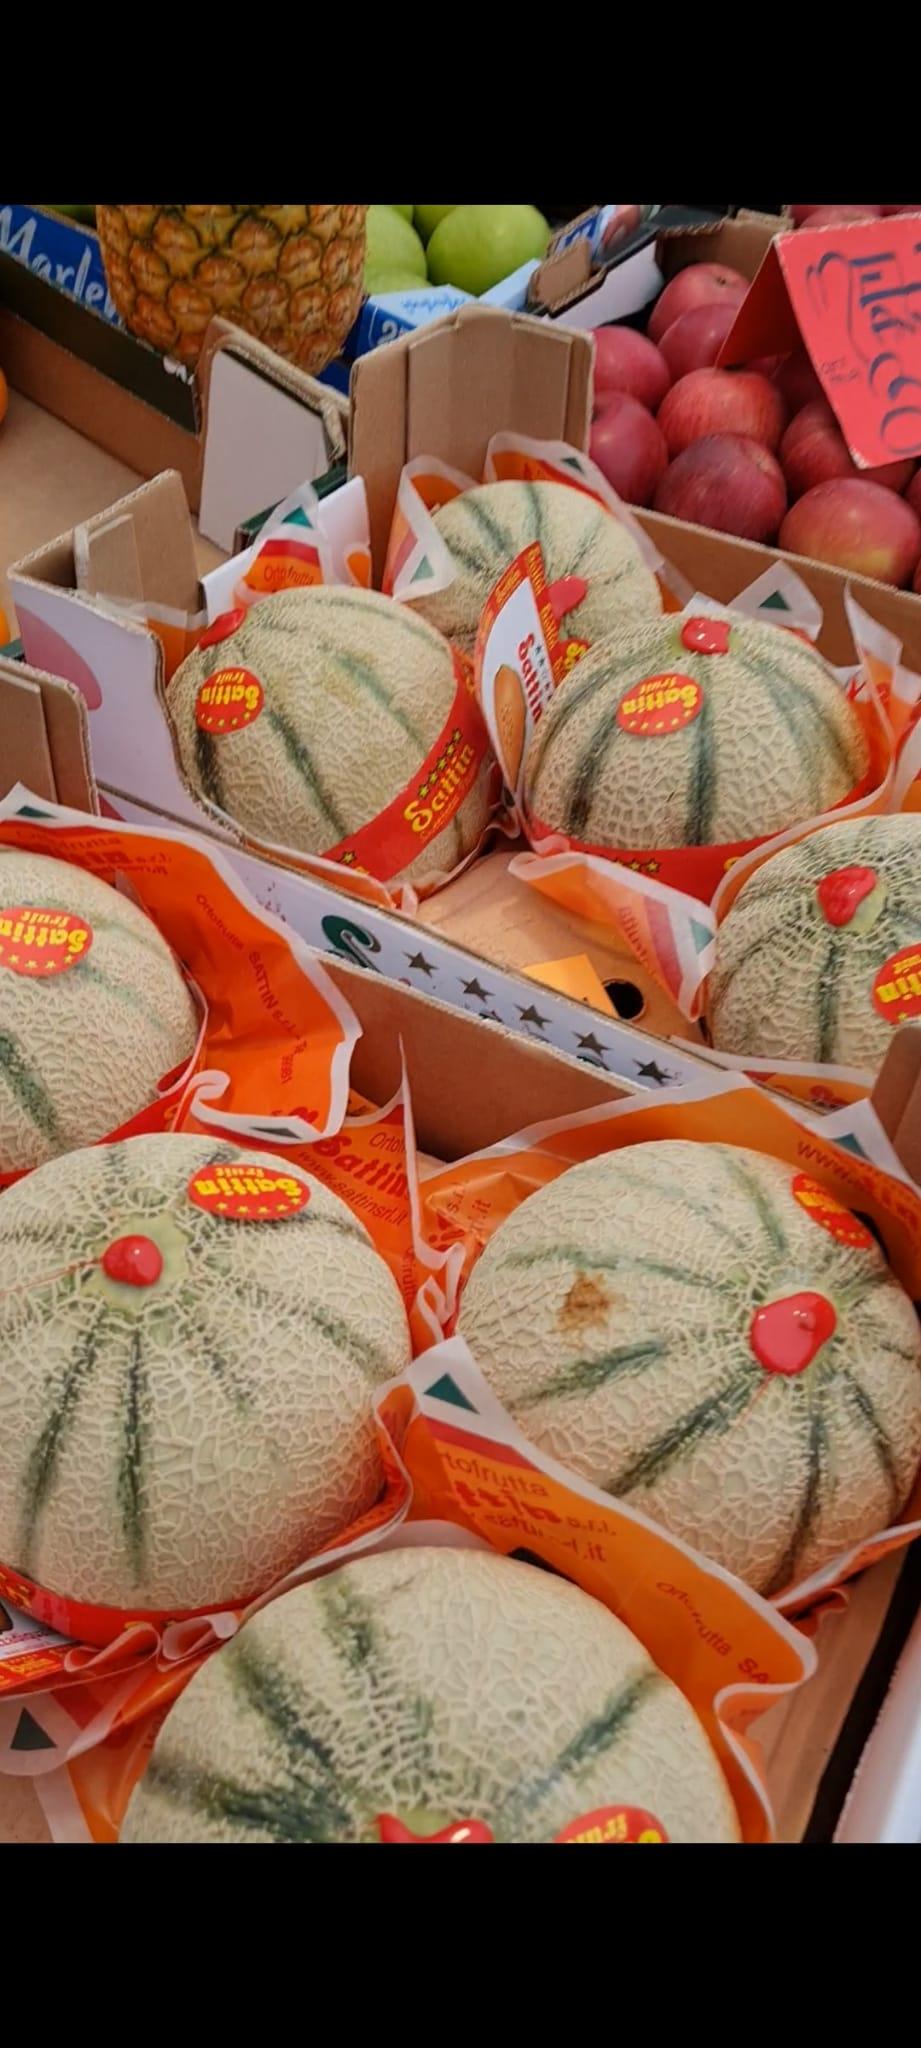 Melone dolcissimo offerta